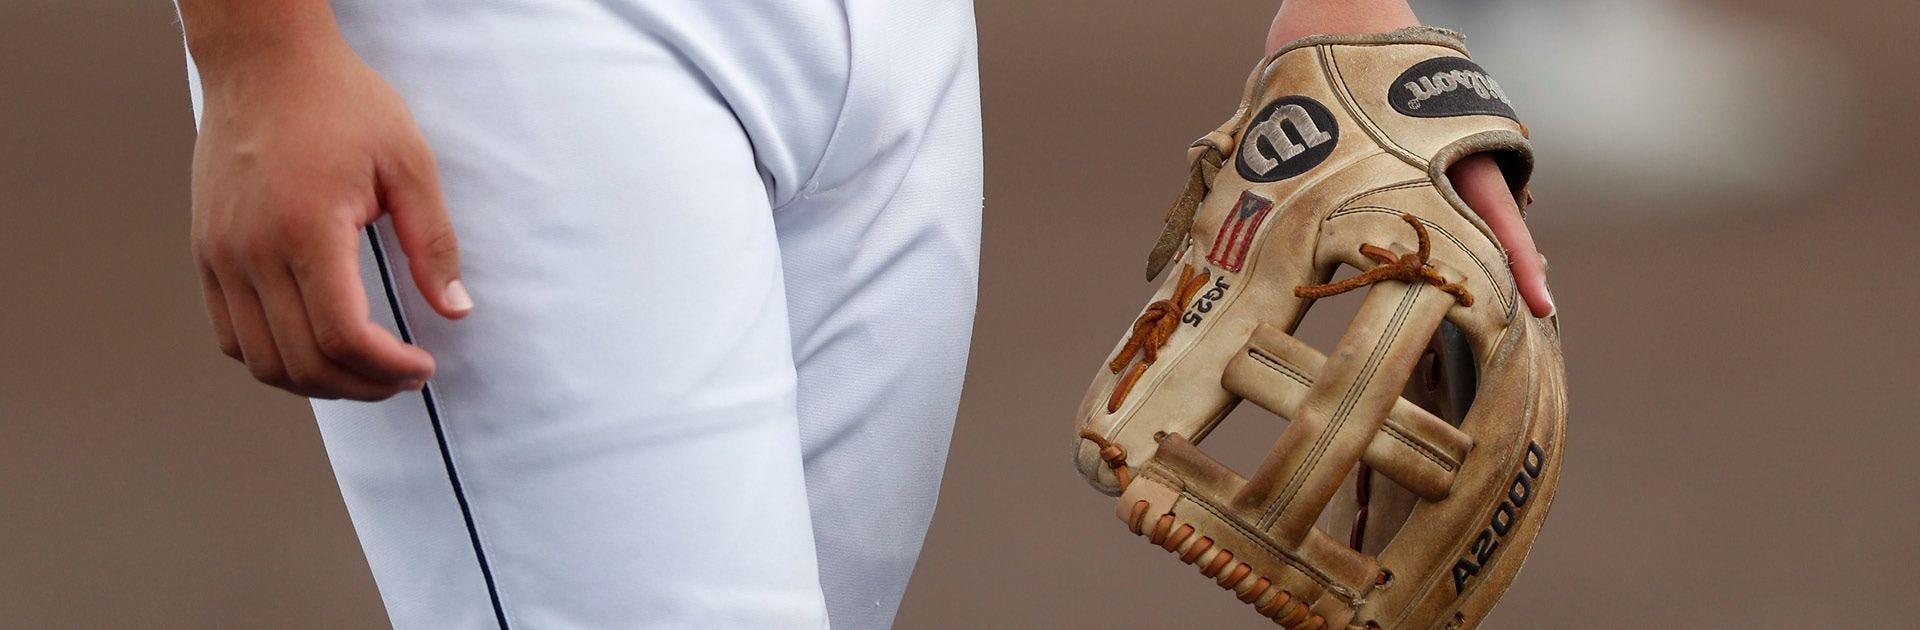 How to Choose a Baseball Glove